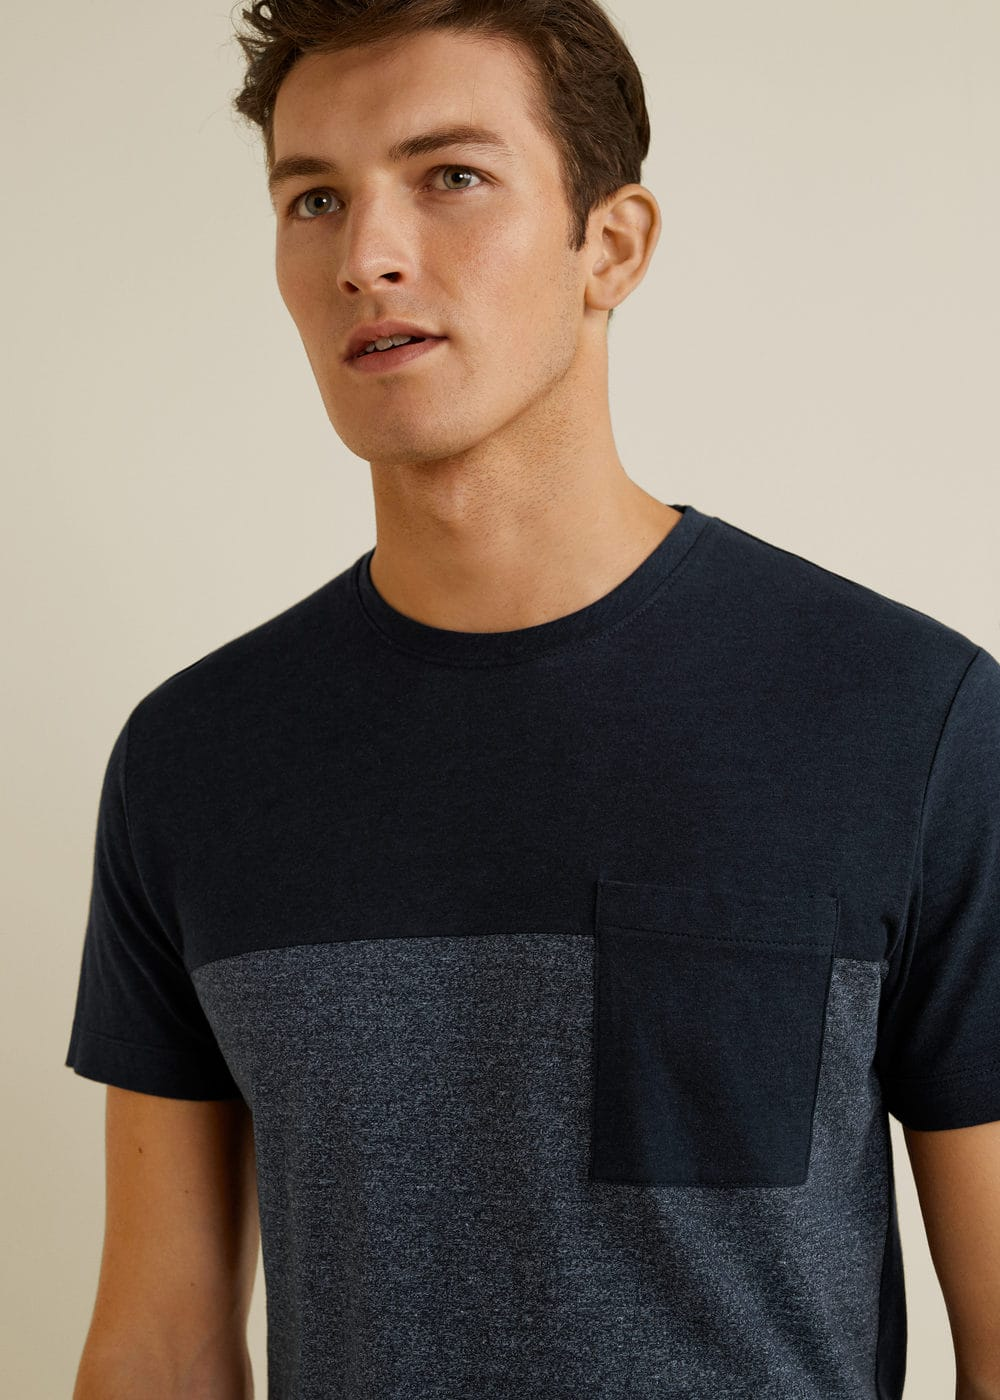 Mango - Camiseta combinada bolsillo - 4